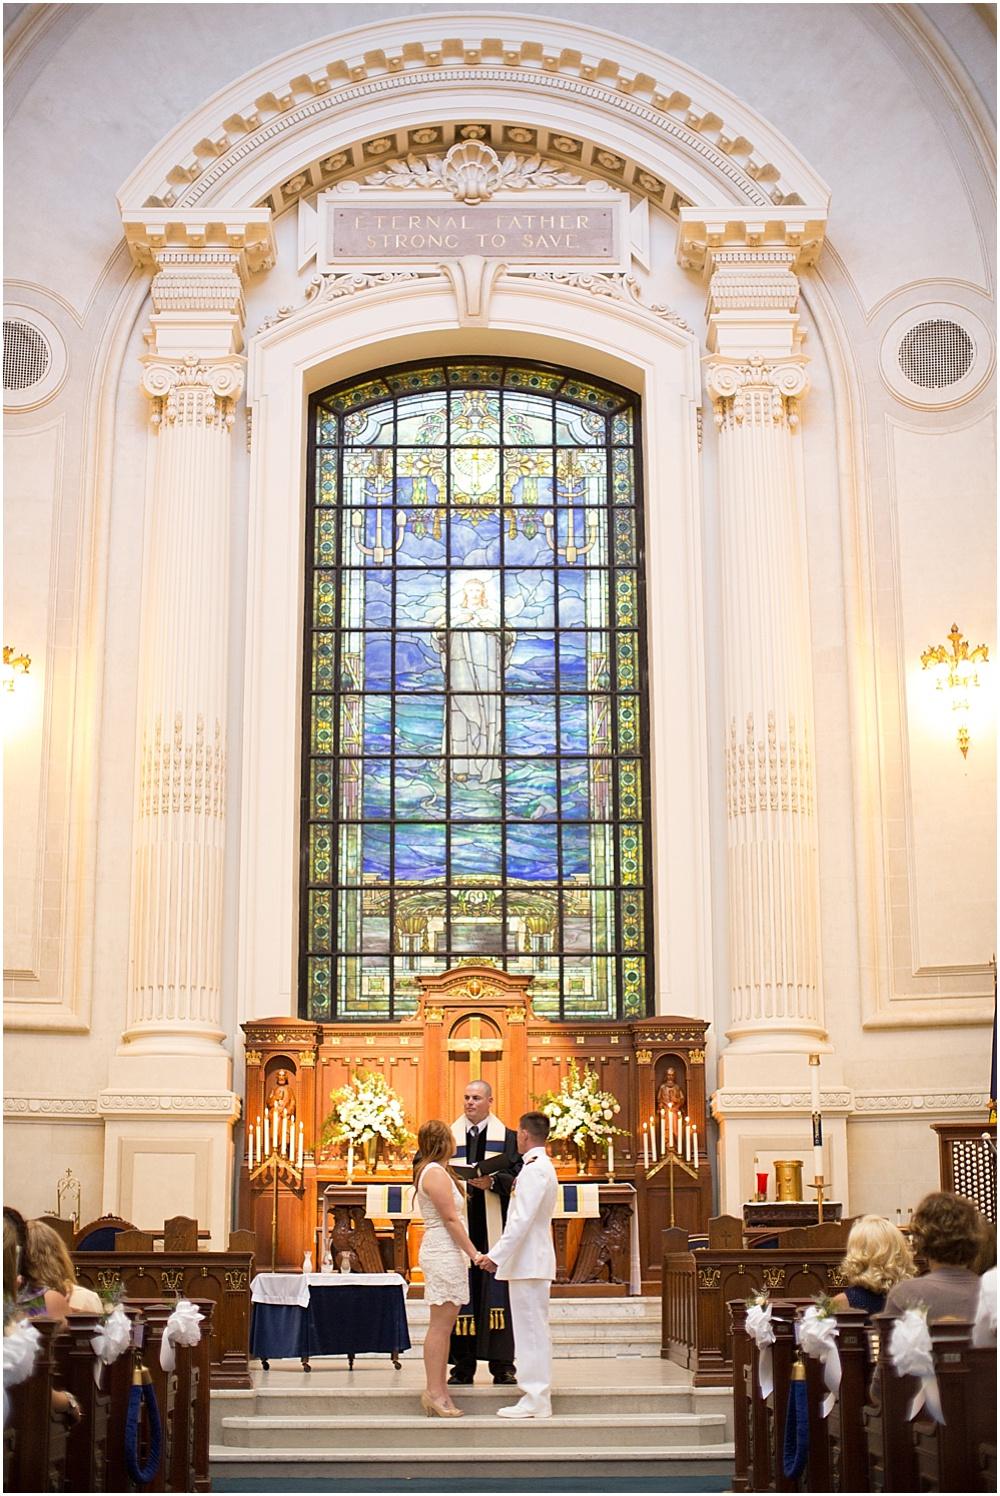 Allison_Nick_United_States_Naval_Academy_Annapolis_Wedding_Photographer_0027